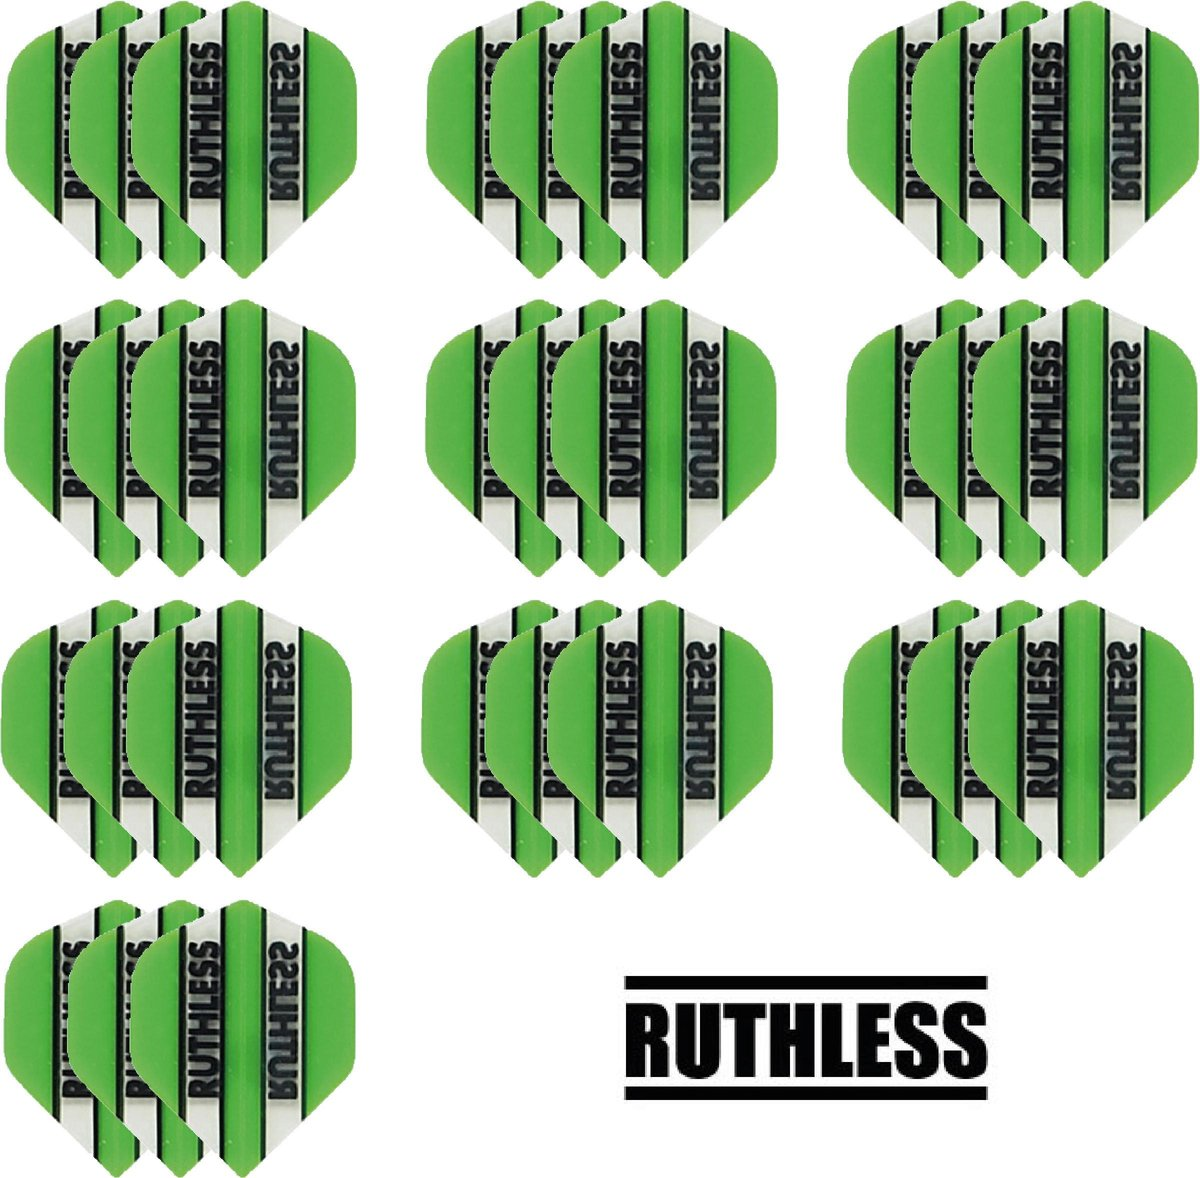 deDartshop 10 Sets (30 stuks) Ruthless flights Multipack - Groen - darts flights